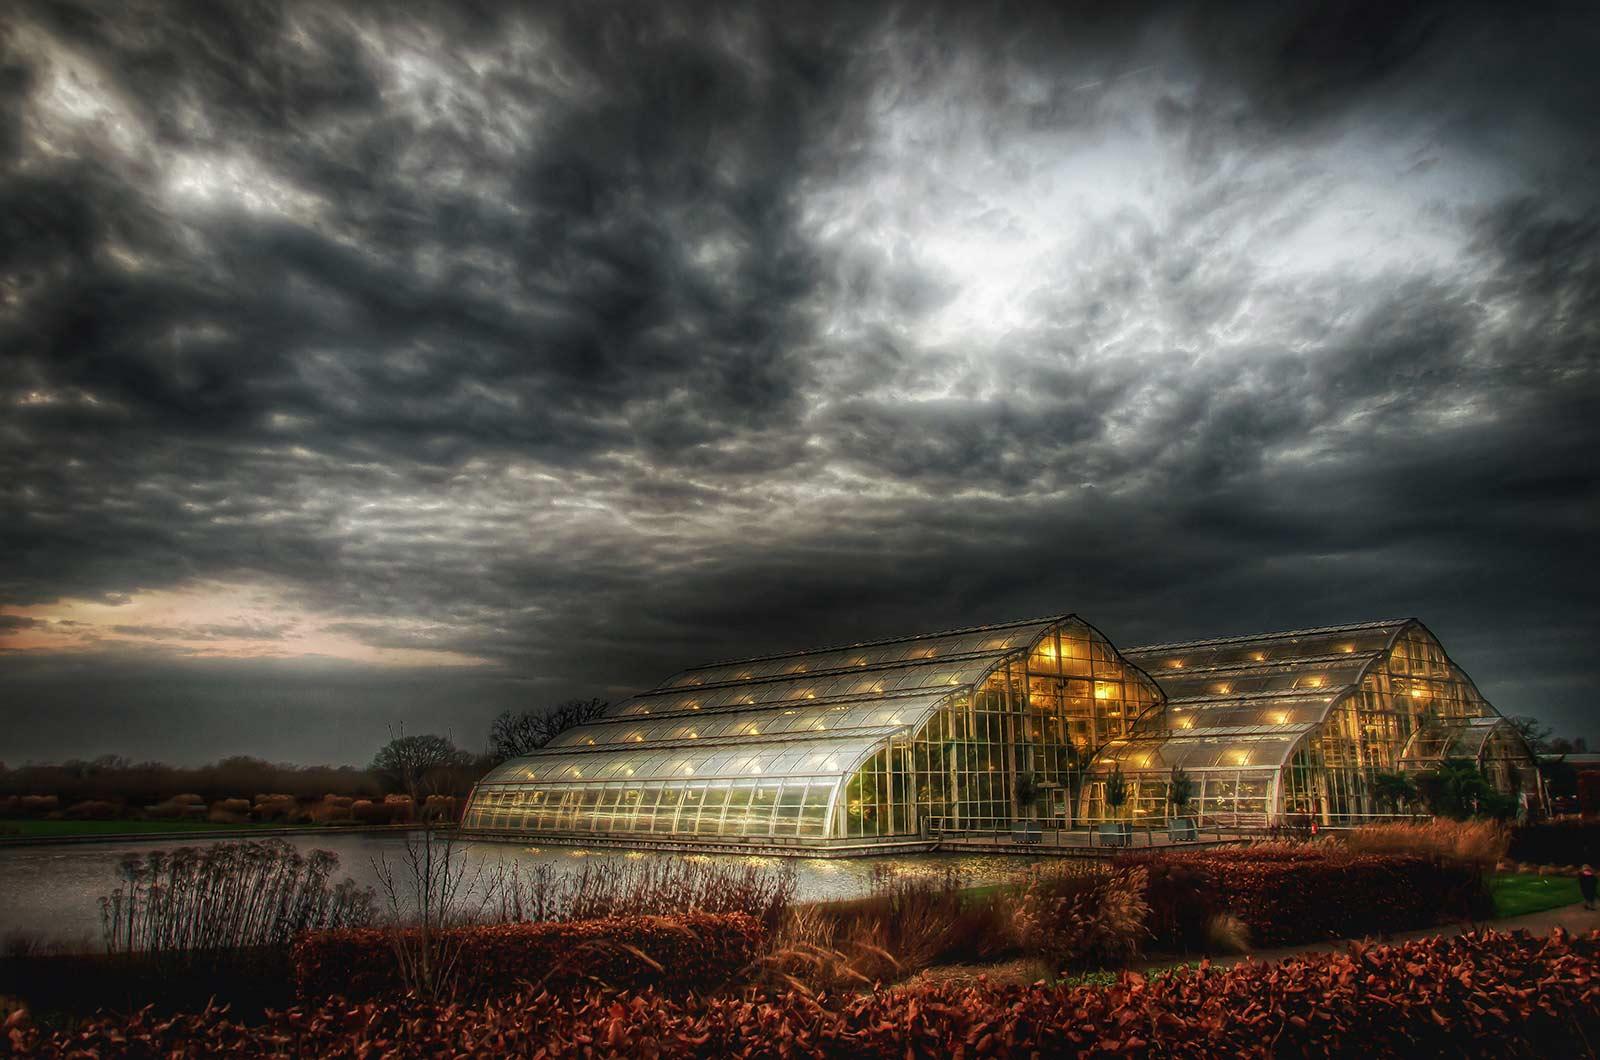 Стивен Рид / Stephen Reed, Победитель в категории «Праздник сада», Фотоконкурс RHS Photographic Competition